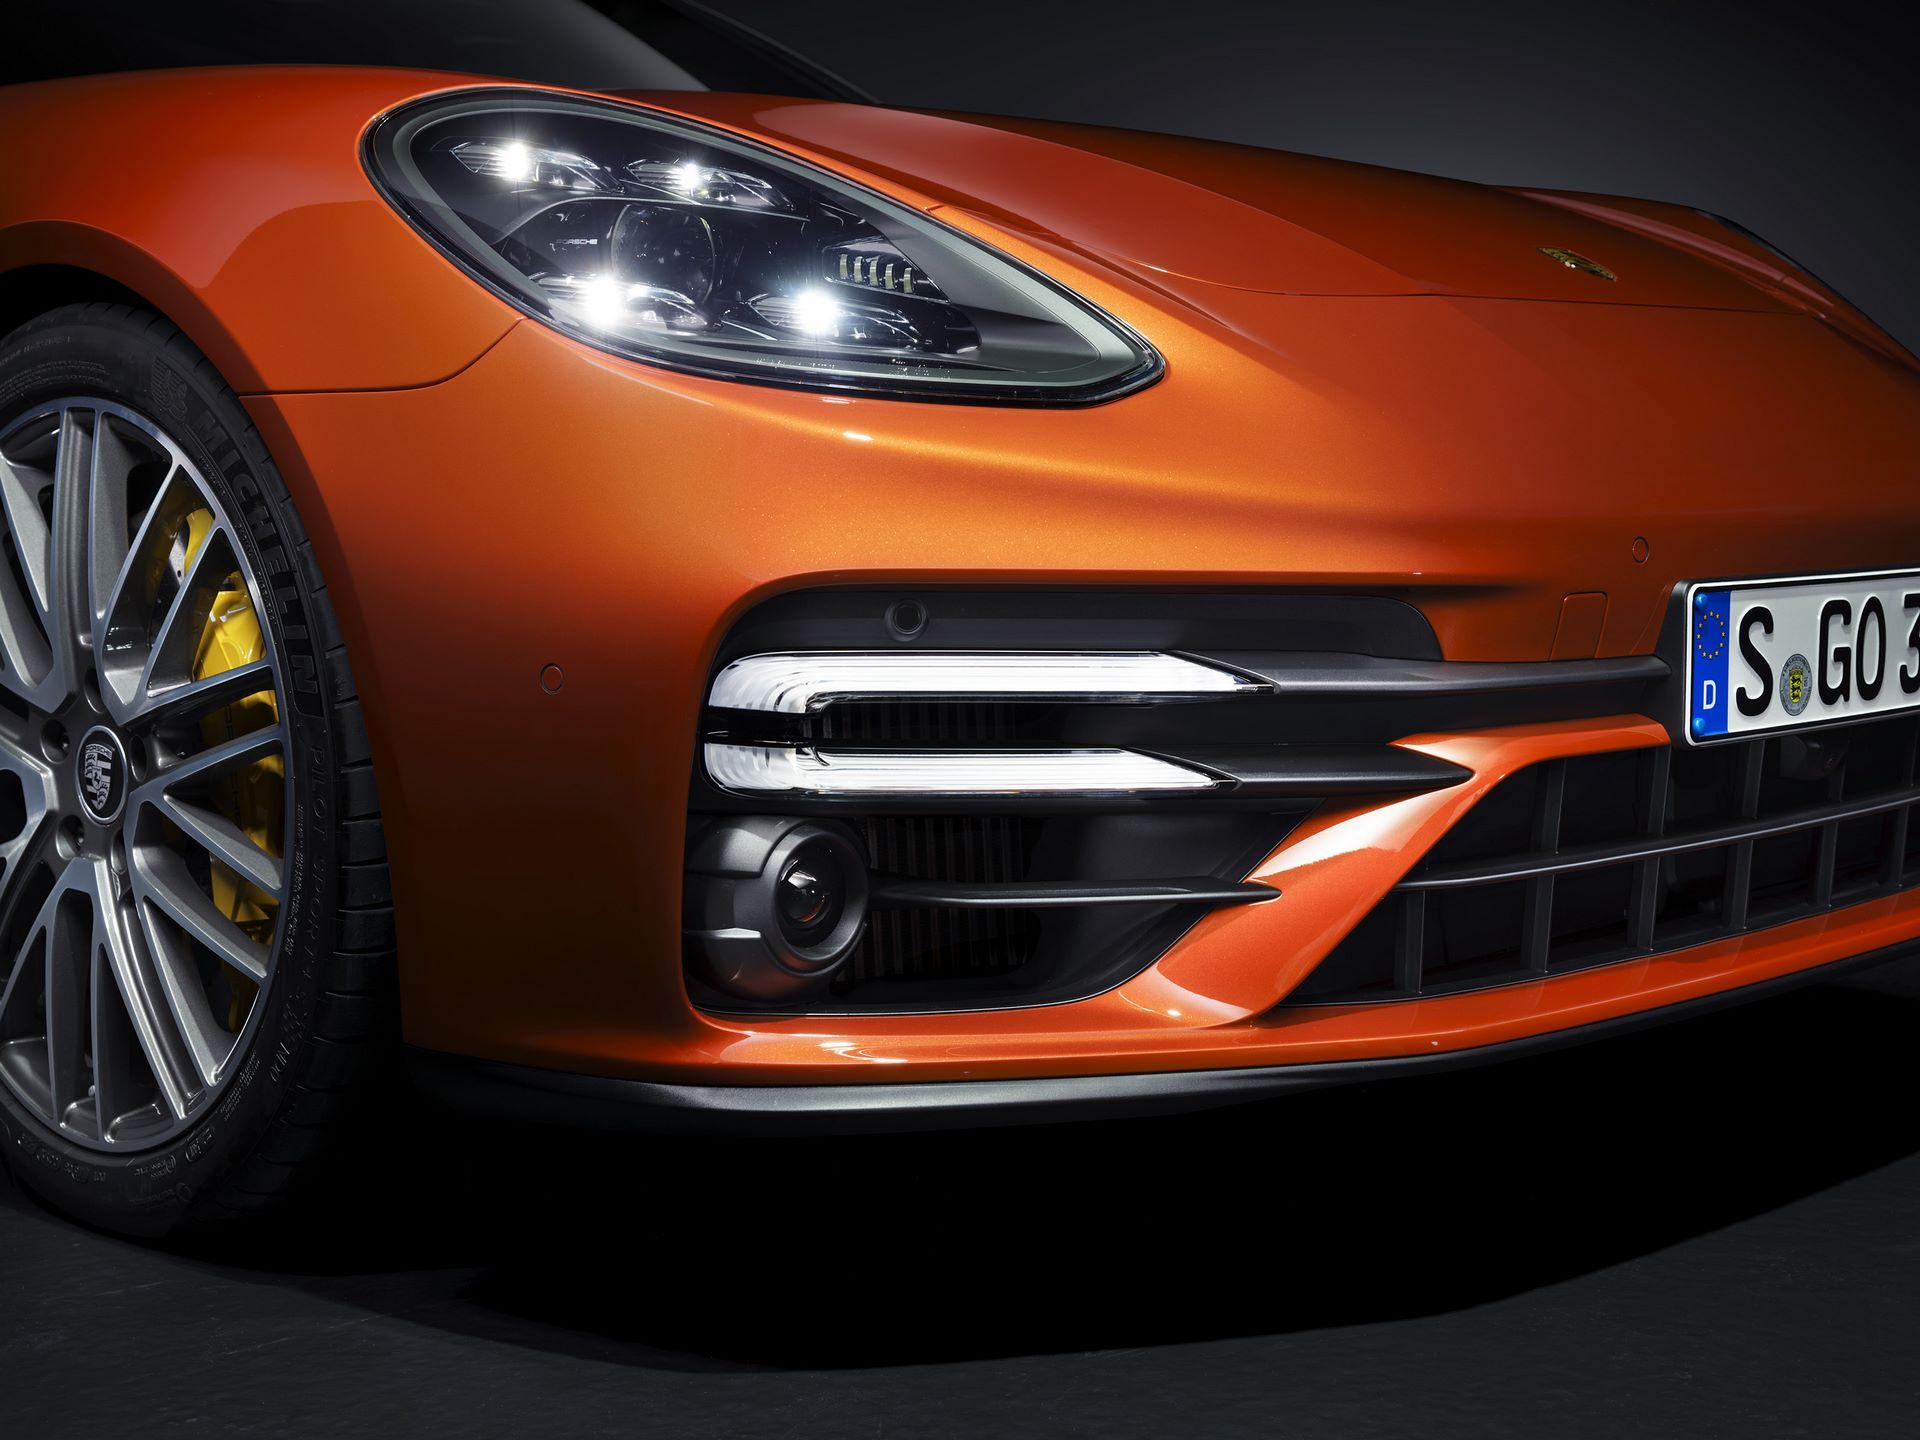 Porsche-Panamera-facelift-2020-7